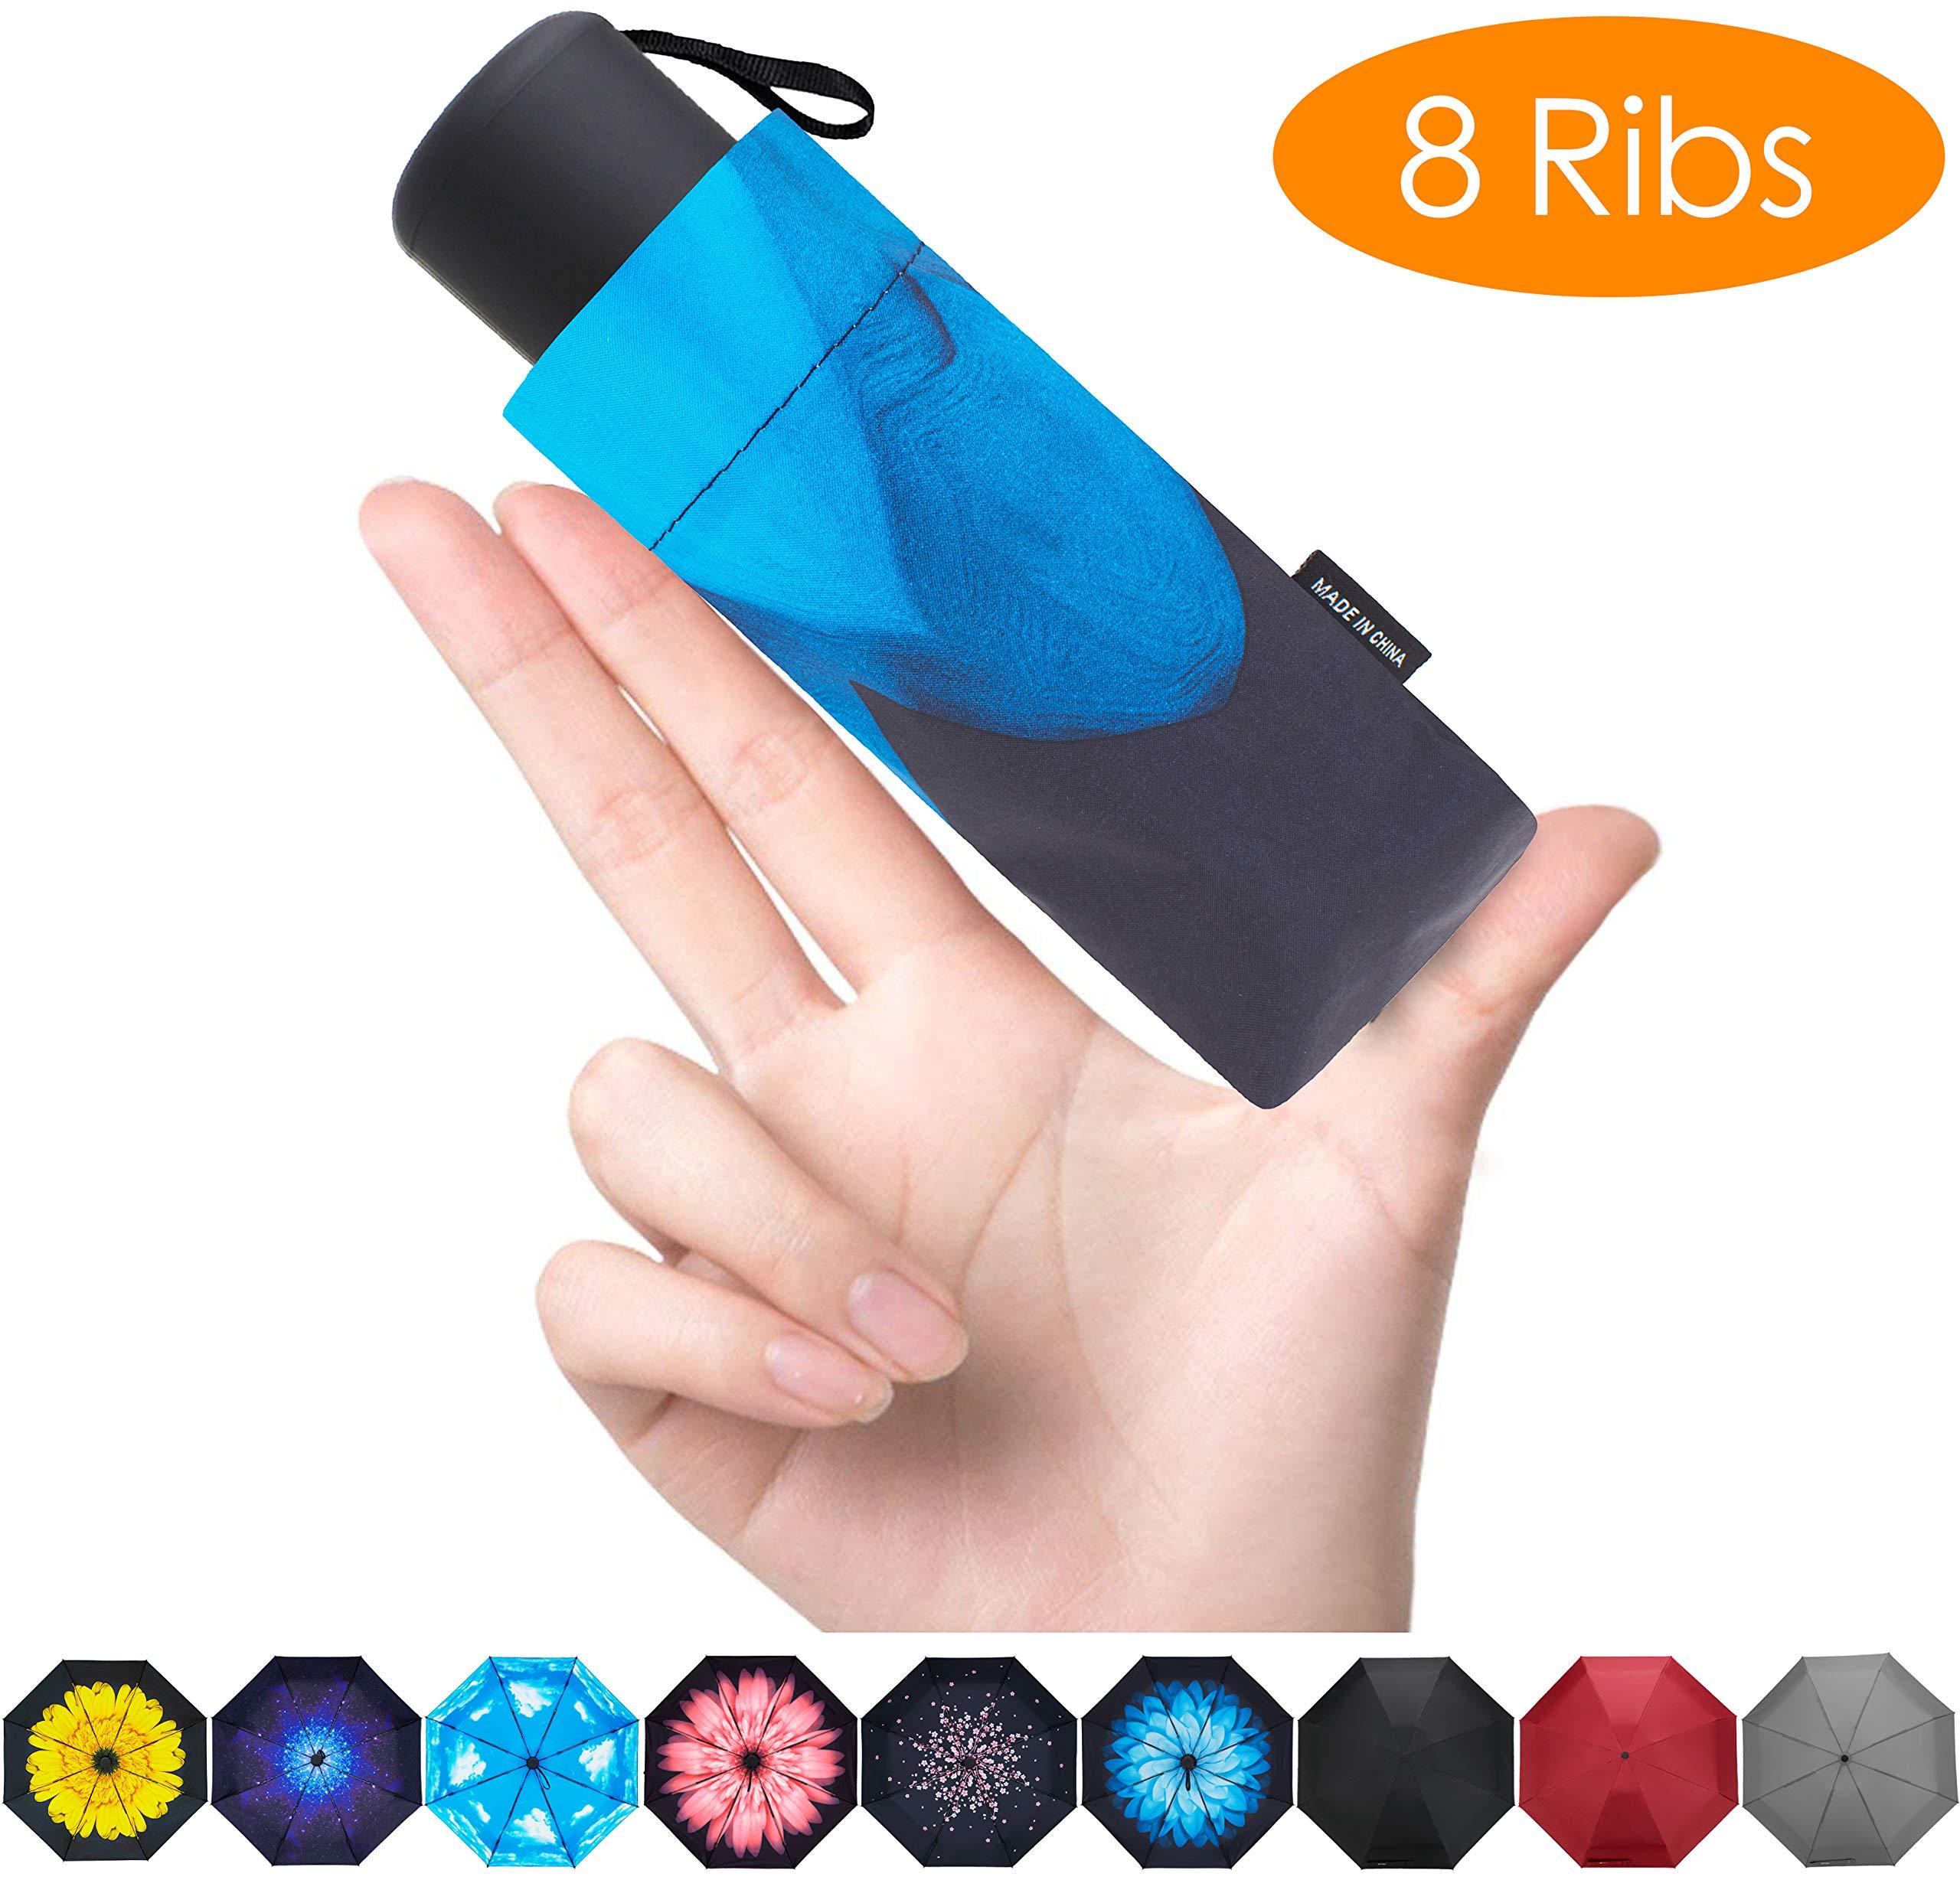 FidusUpgraded 8 Ribs Mini Portable Sun&Rain Lightweight WindproofUmbrella - Compact Parasol Outdoor Travel Umbrella for MenWomen Kids-Blue Daisy by Fidus